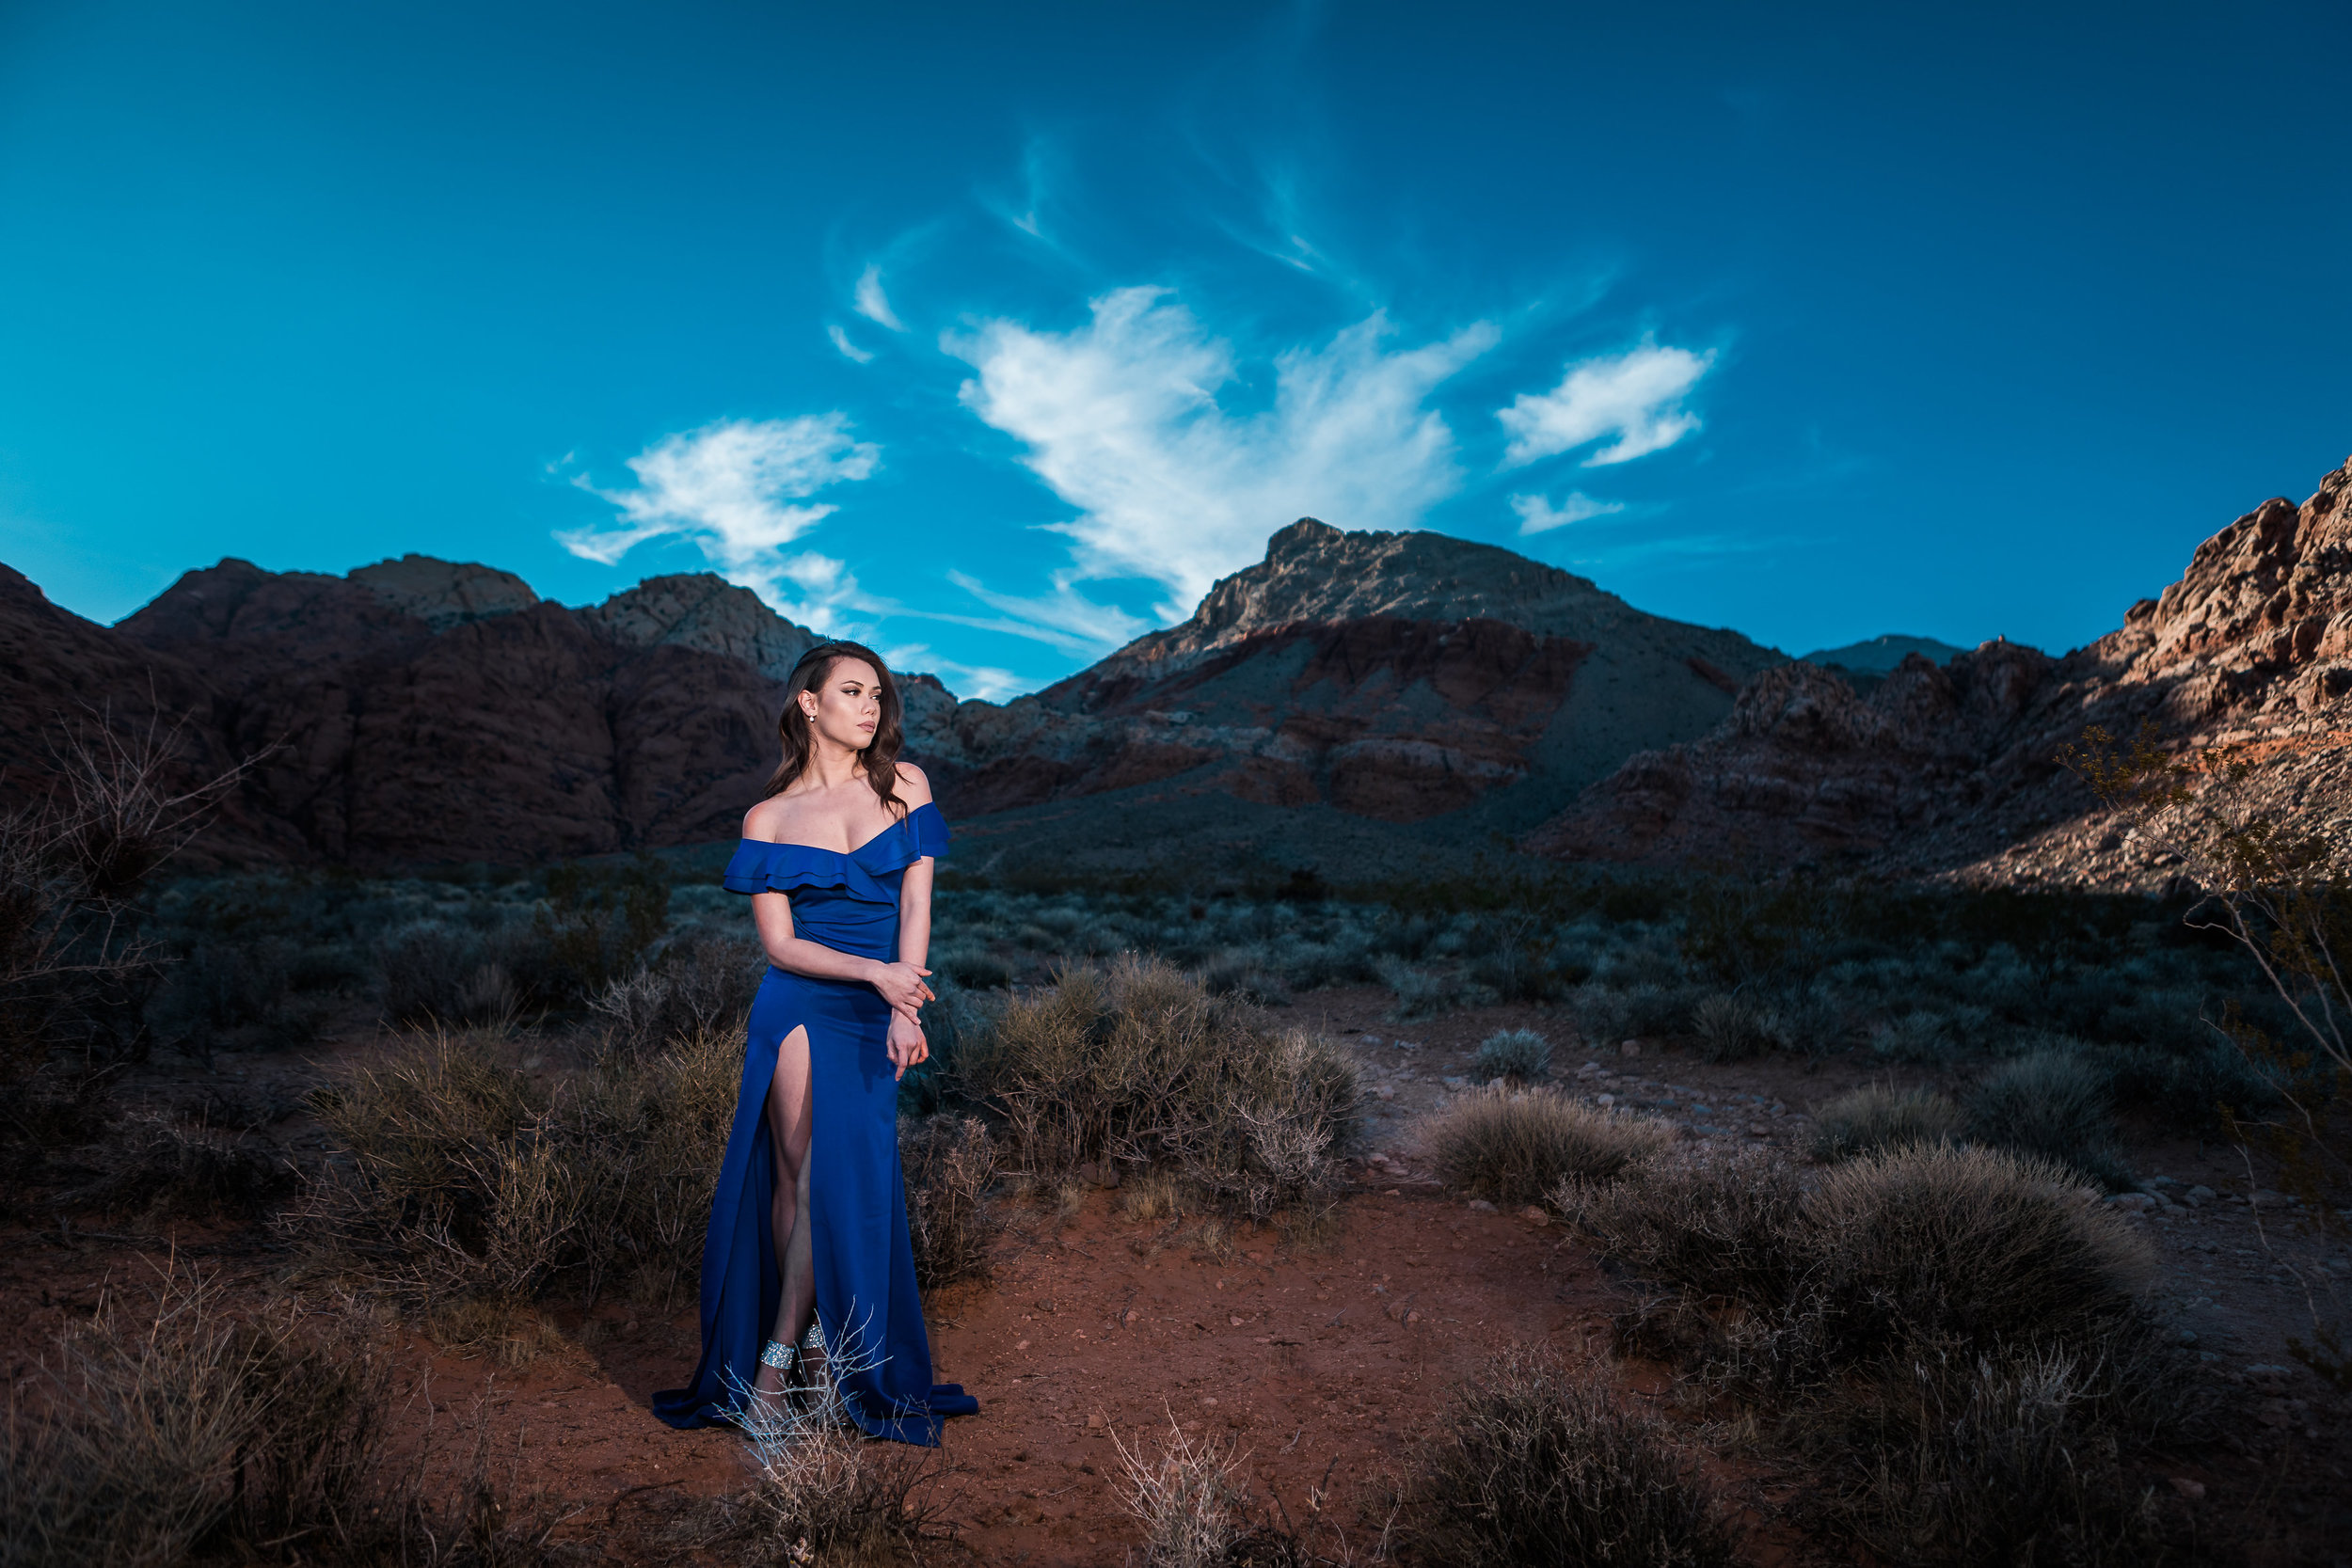 New_York_Photographer_Las_Vegas_Desert-295.jpg